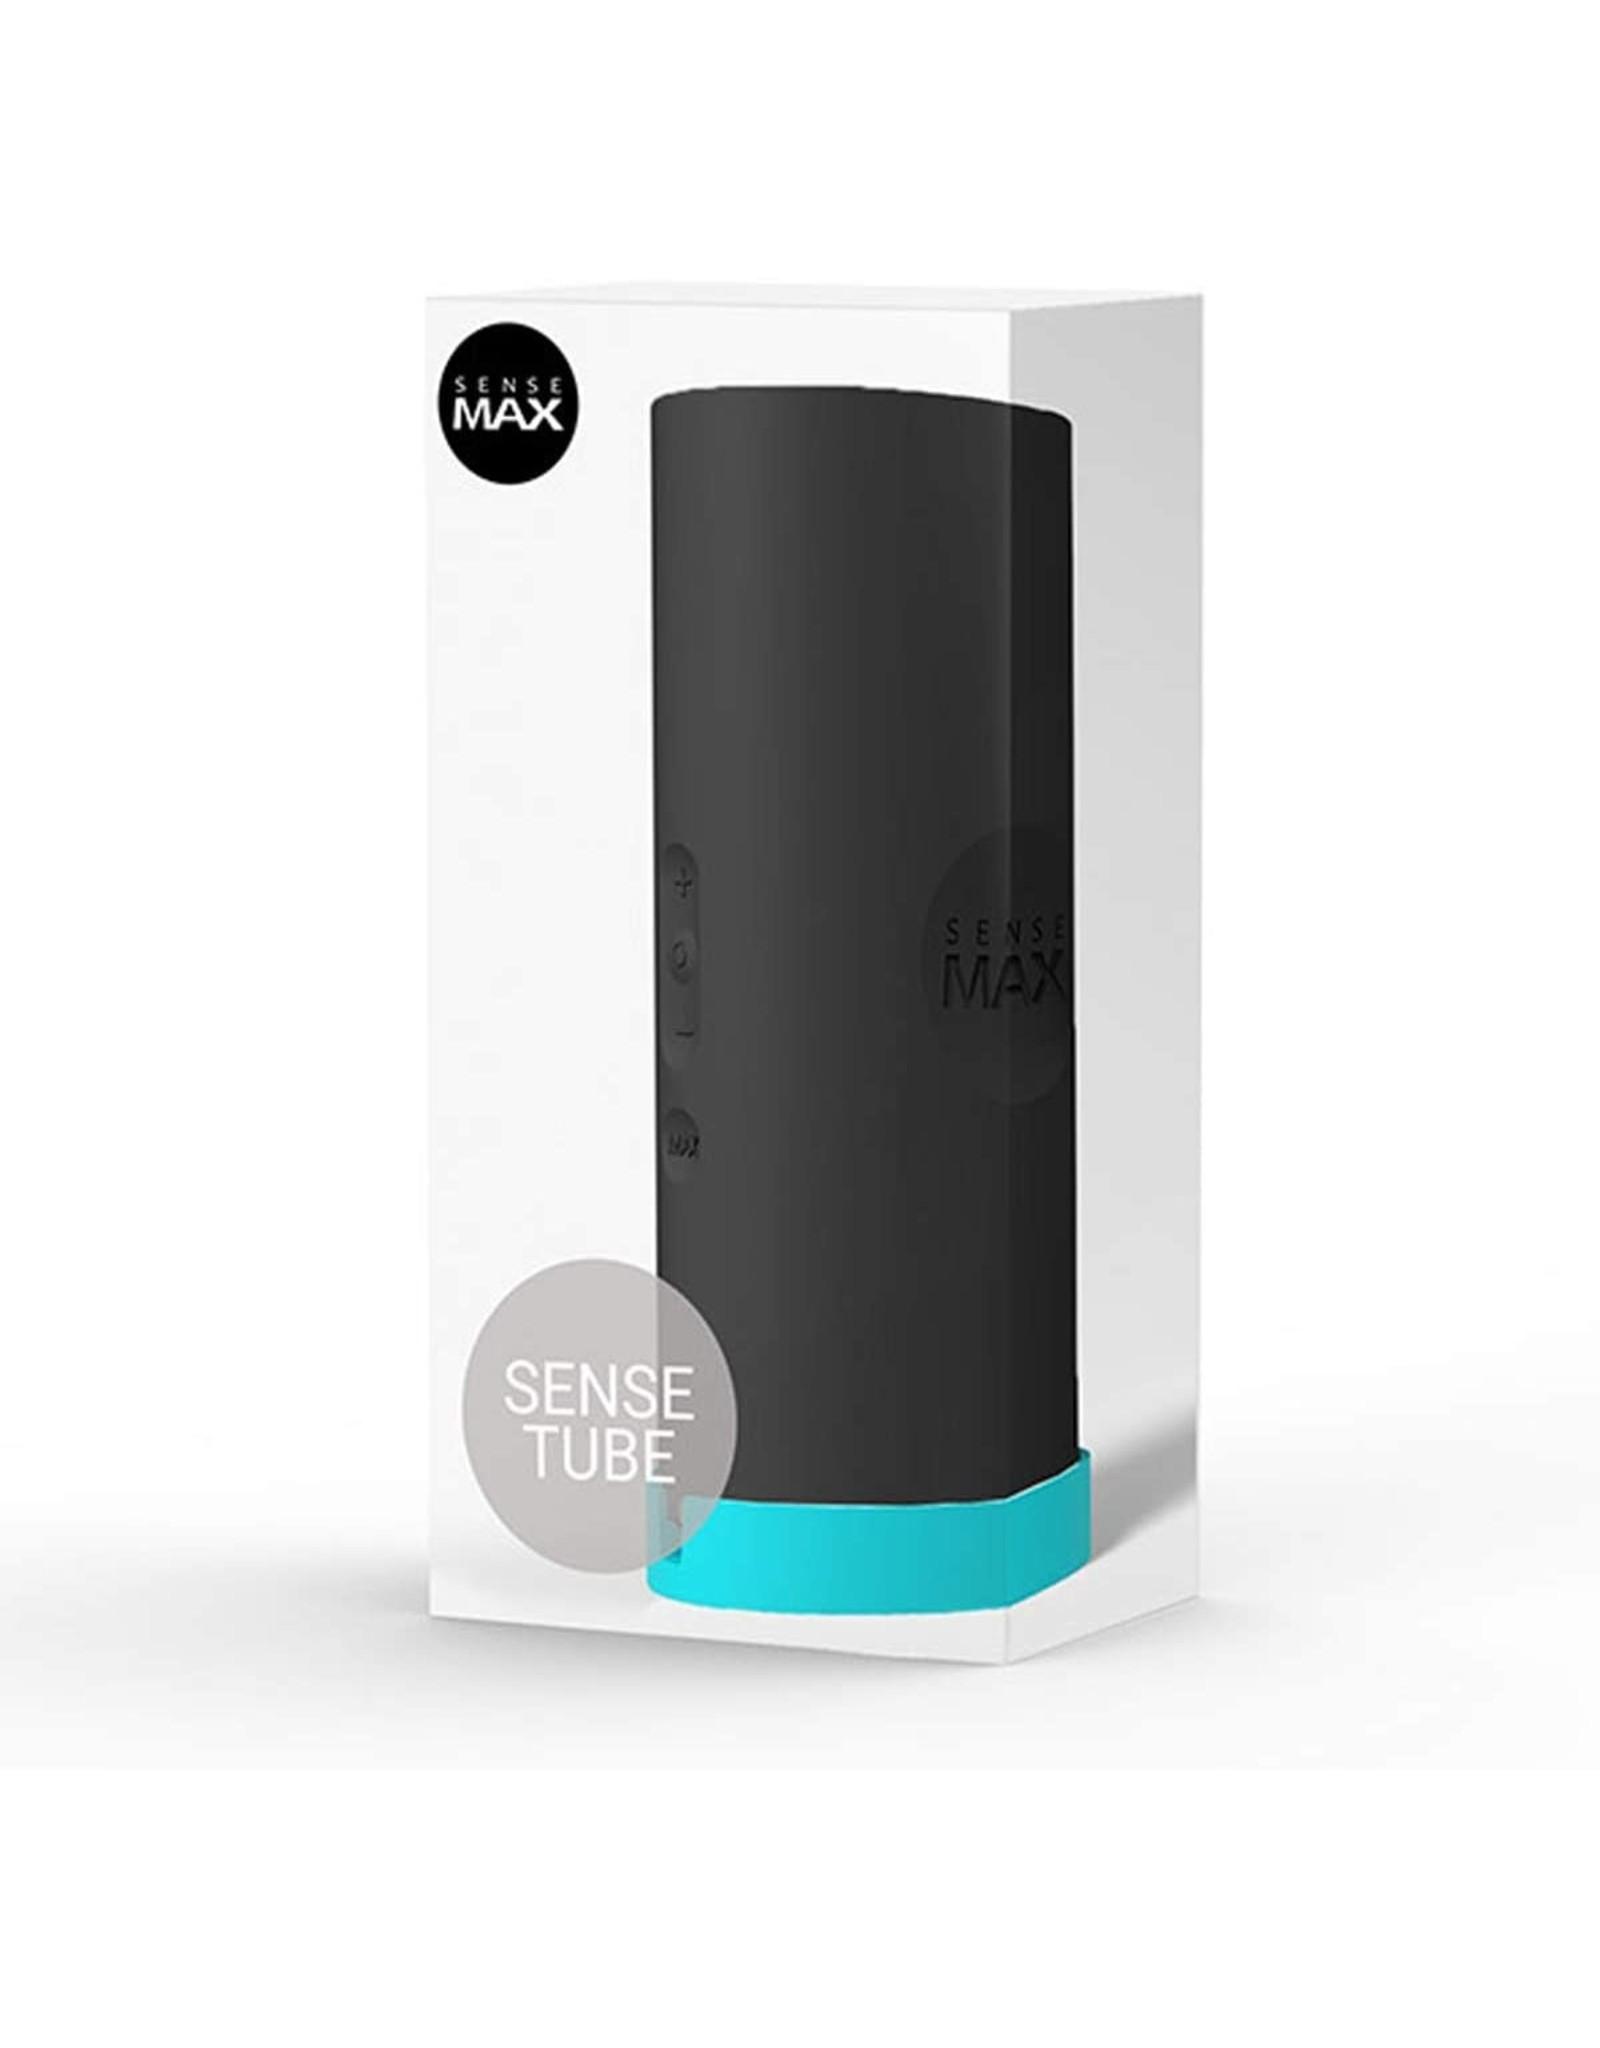 Sense Tube Vibrating Masturbation Cup With Bluetooth